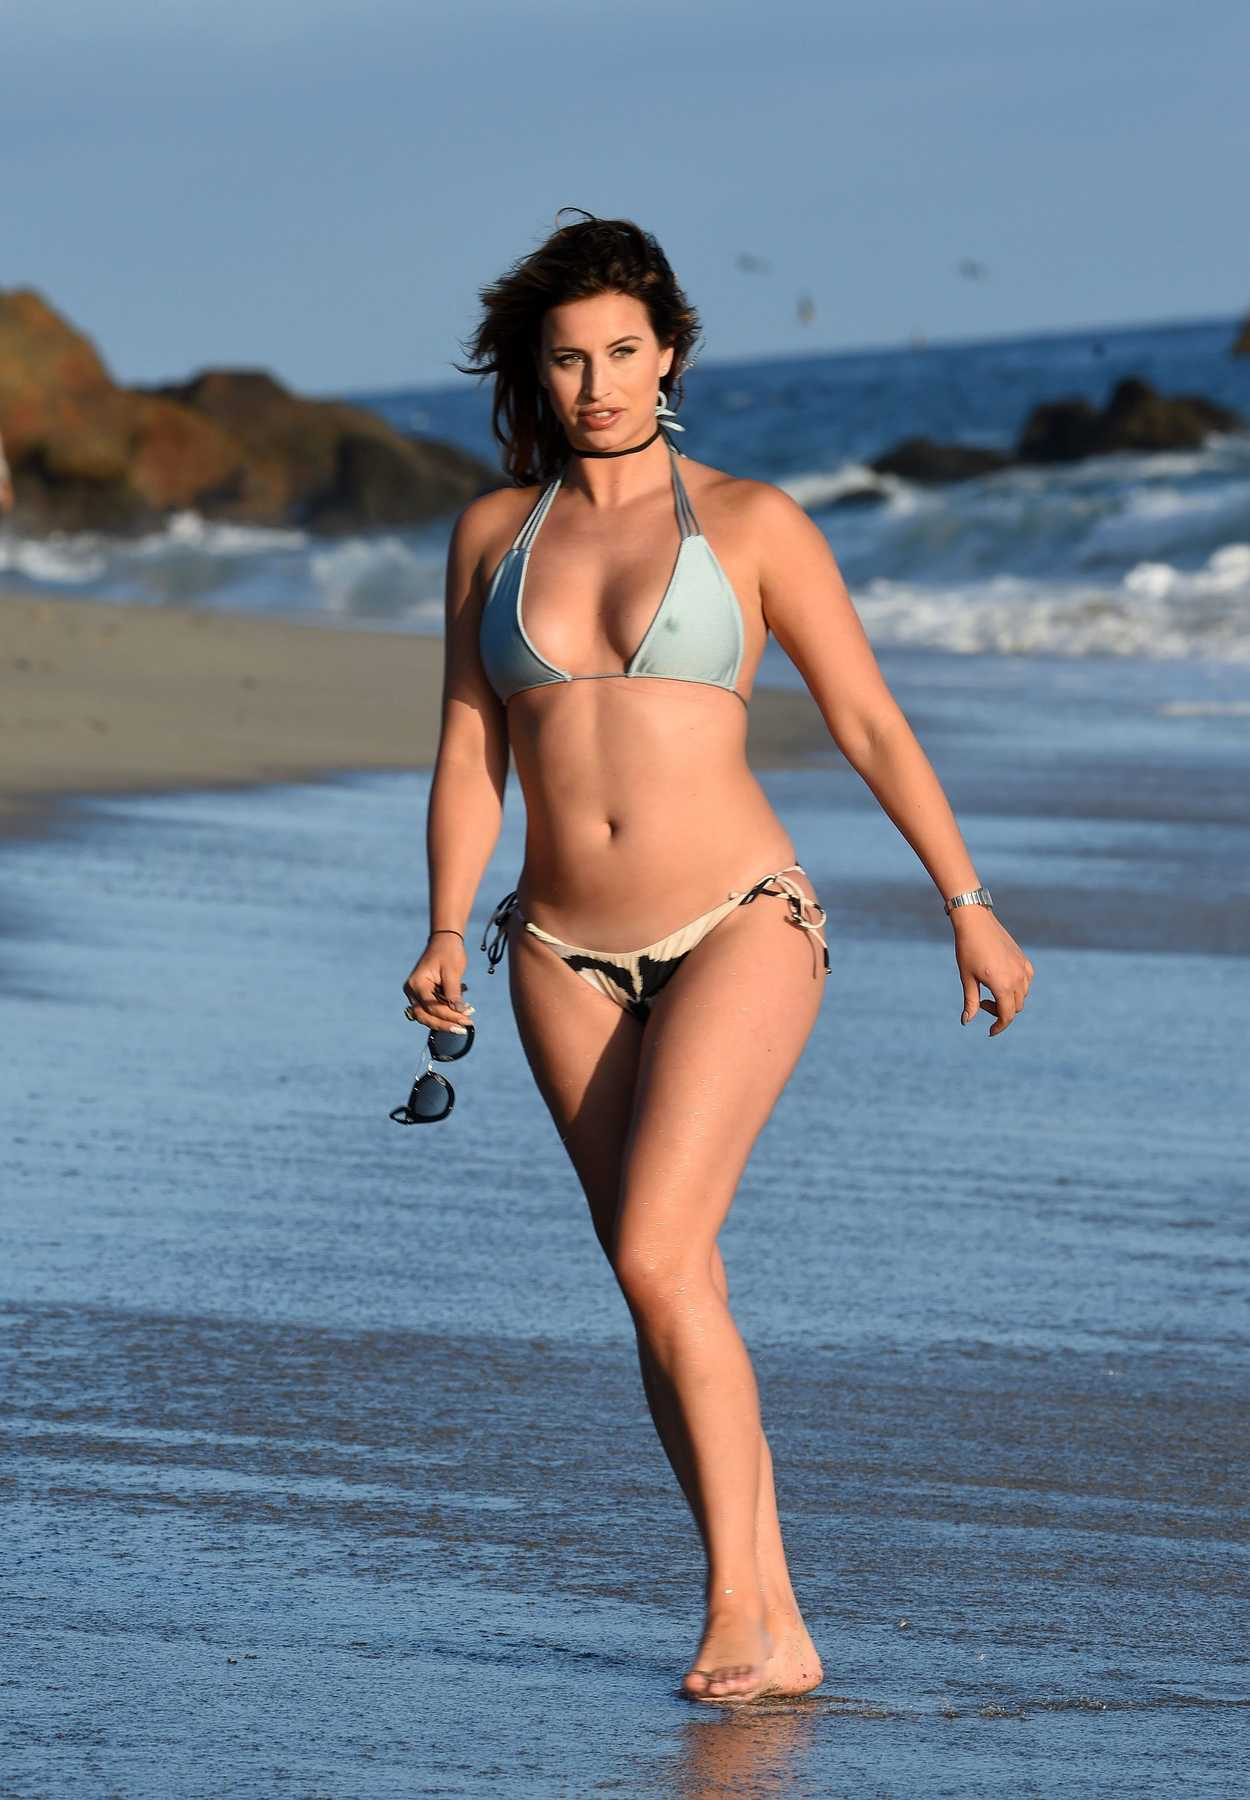 Ferne McCann in Bikini at the Beach in Los Angeles 07/07 ...